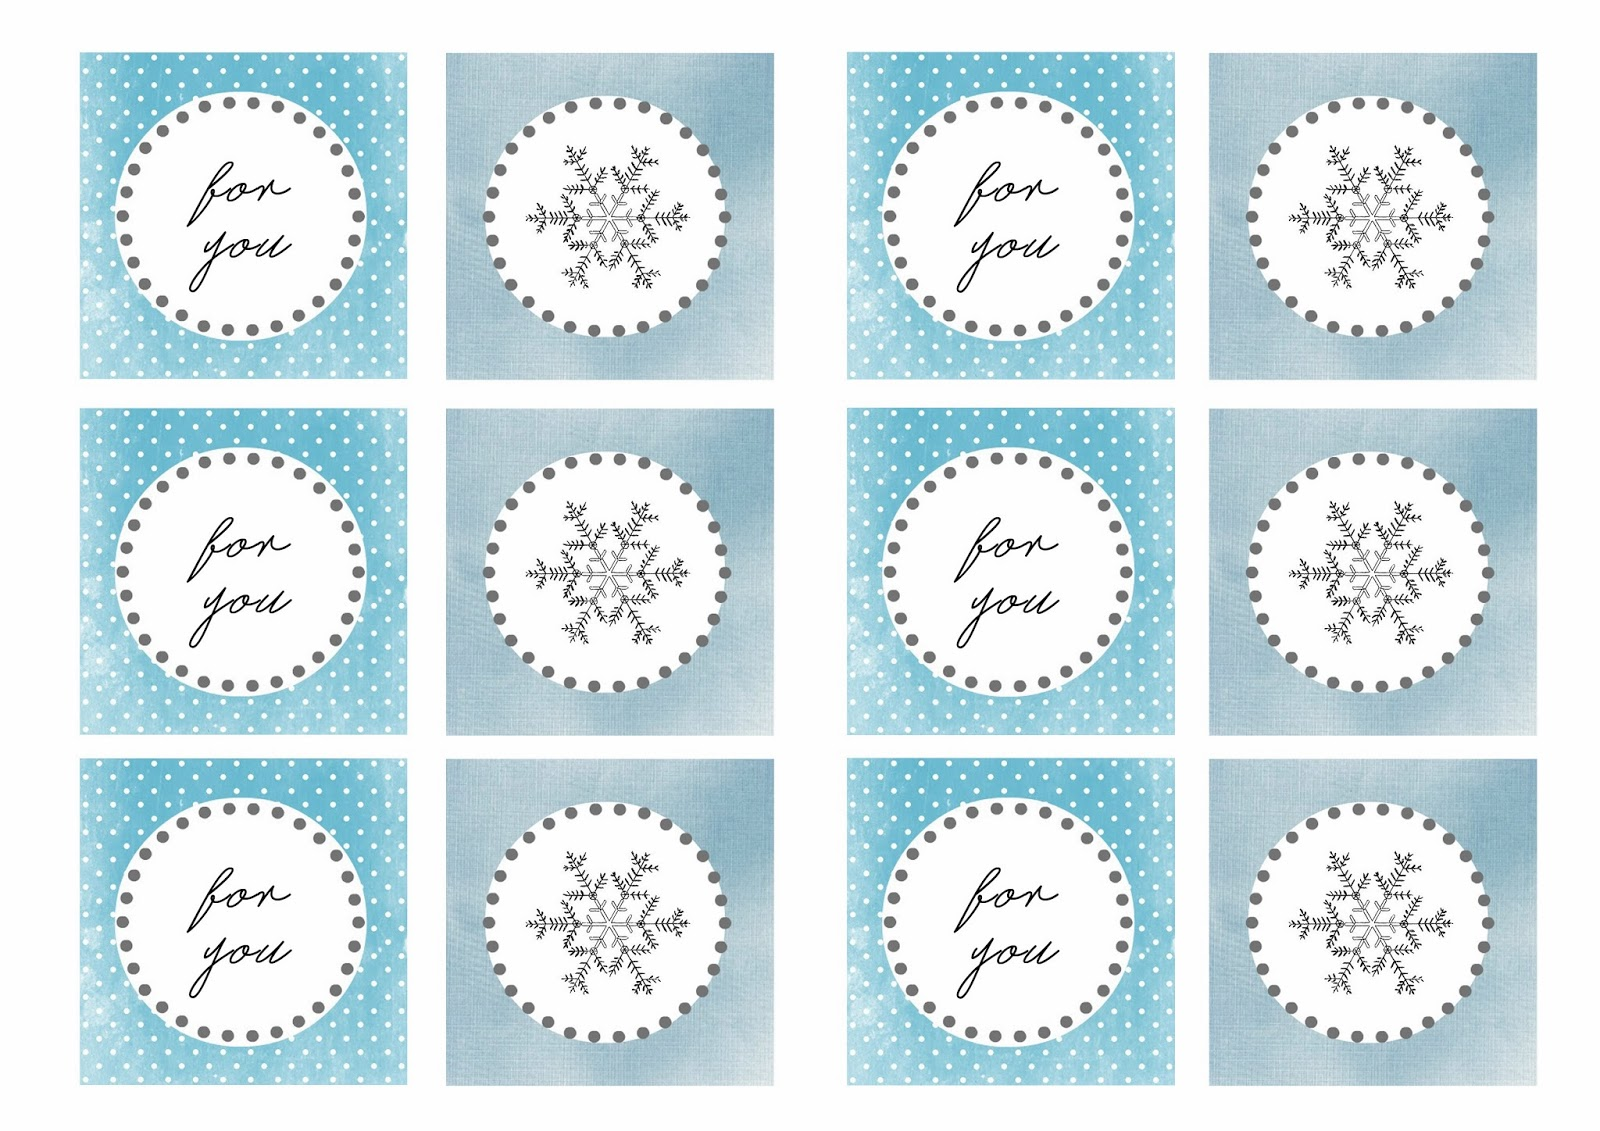 great fun etc ice skating party ideas u0026 printables